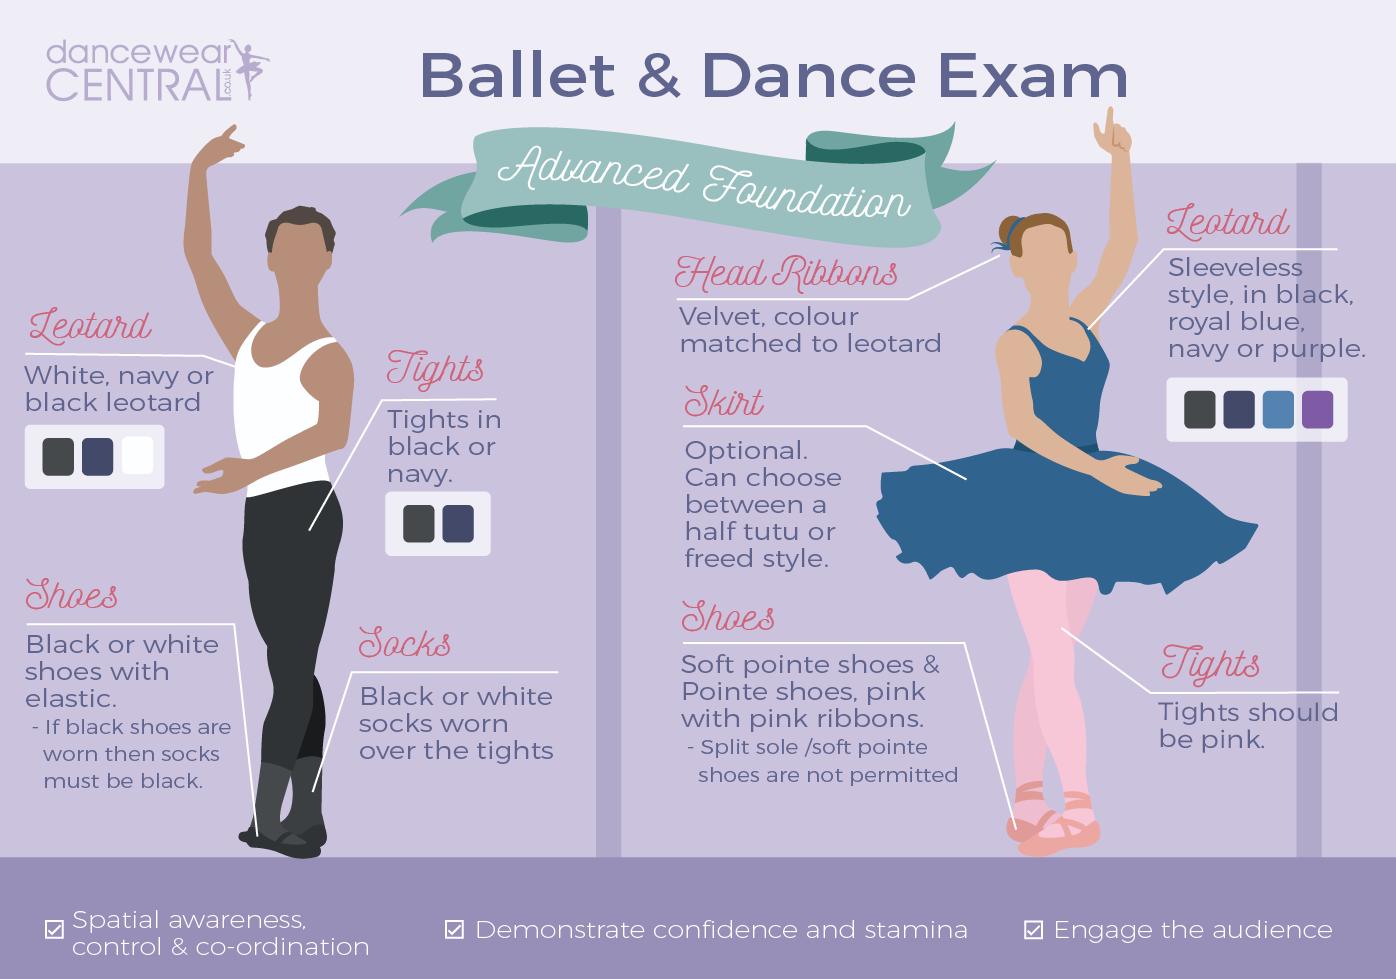 RAD Advanced Foundation Ballet Exam